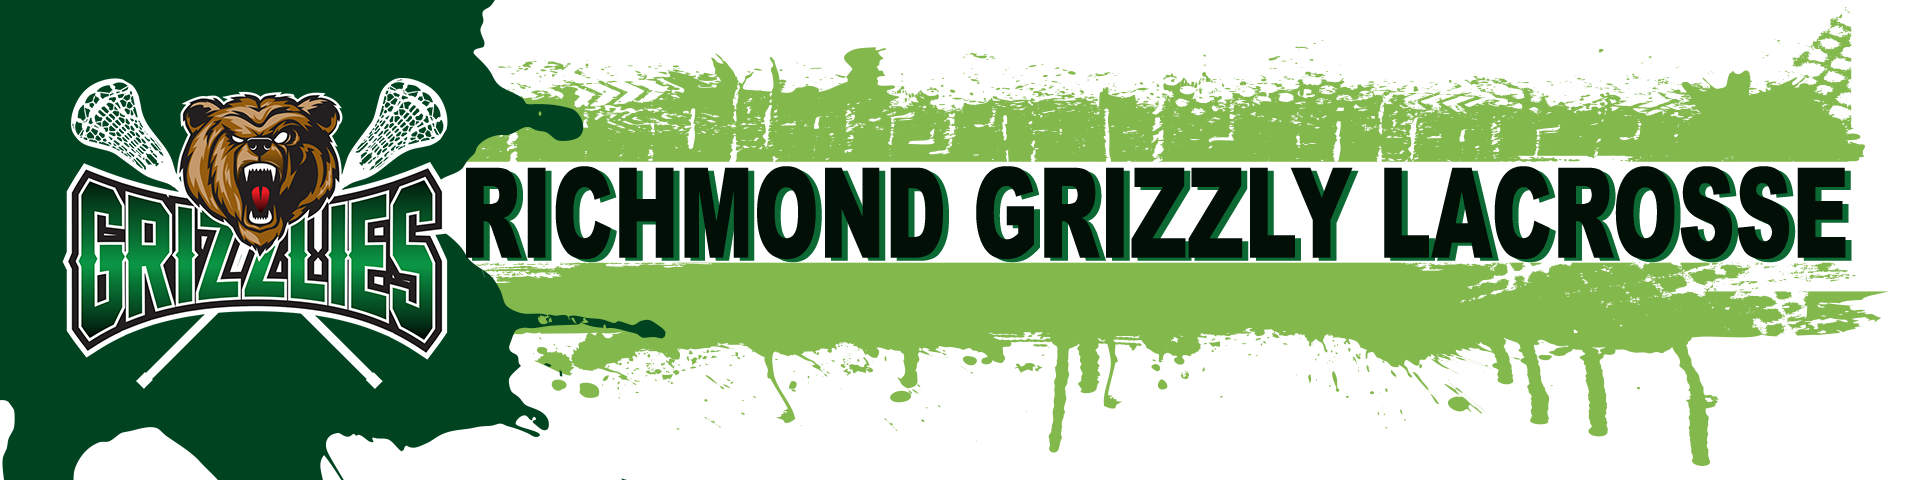 Richmond Grizzly, Lacrosse, Goal, Field